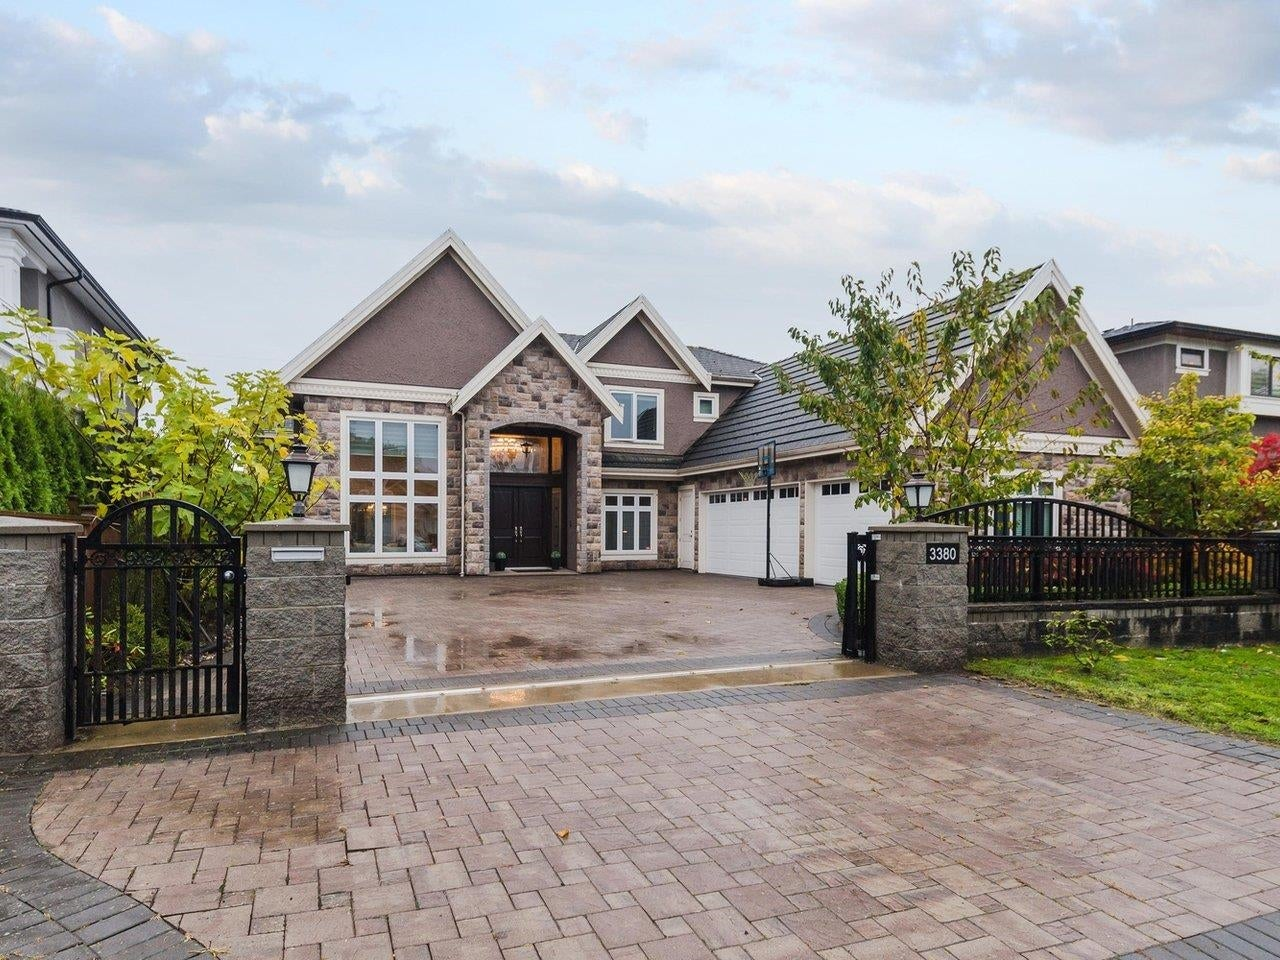 3380 FAIRBROOK CRESCENT - Seafair House/Single Family for sale, 5 Bedrooms (R2627021)